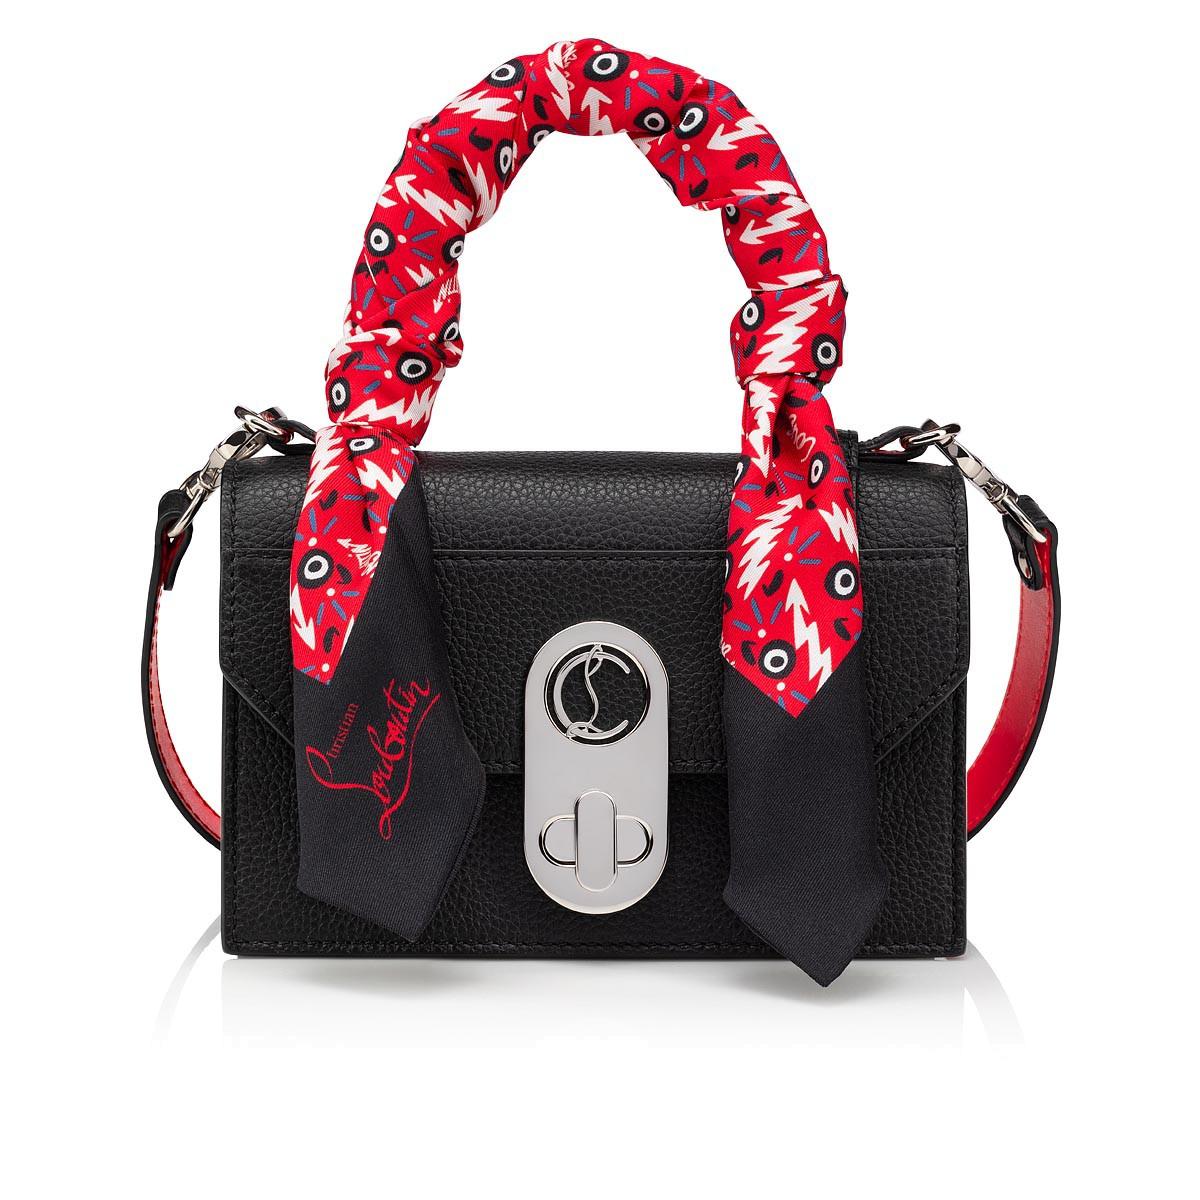 Bags - Elisa Top Handle Mini - Christian Louboutin